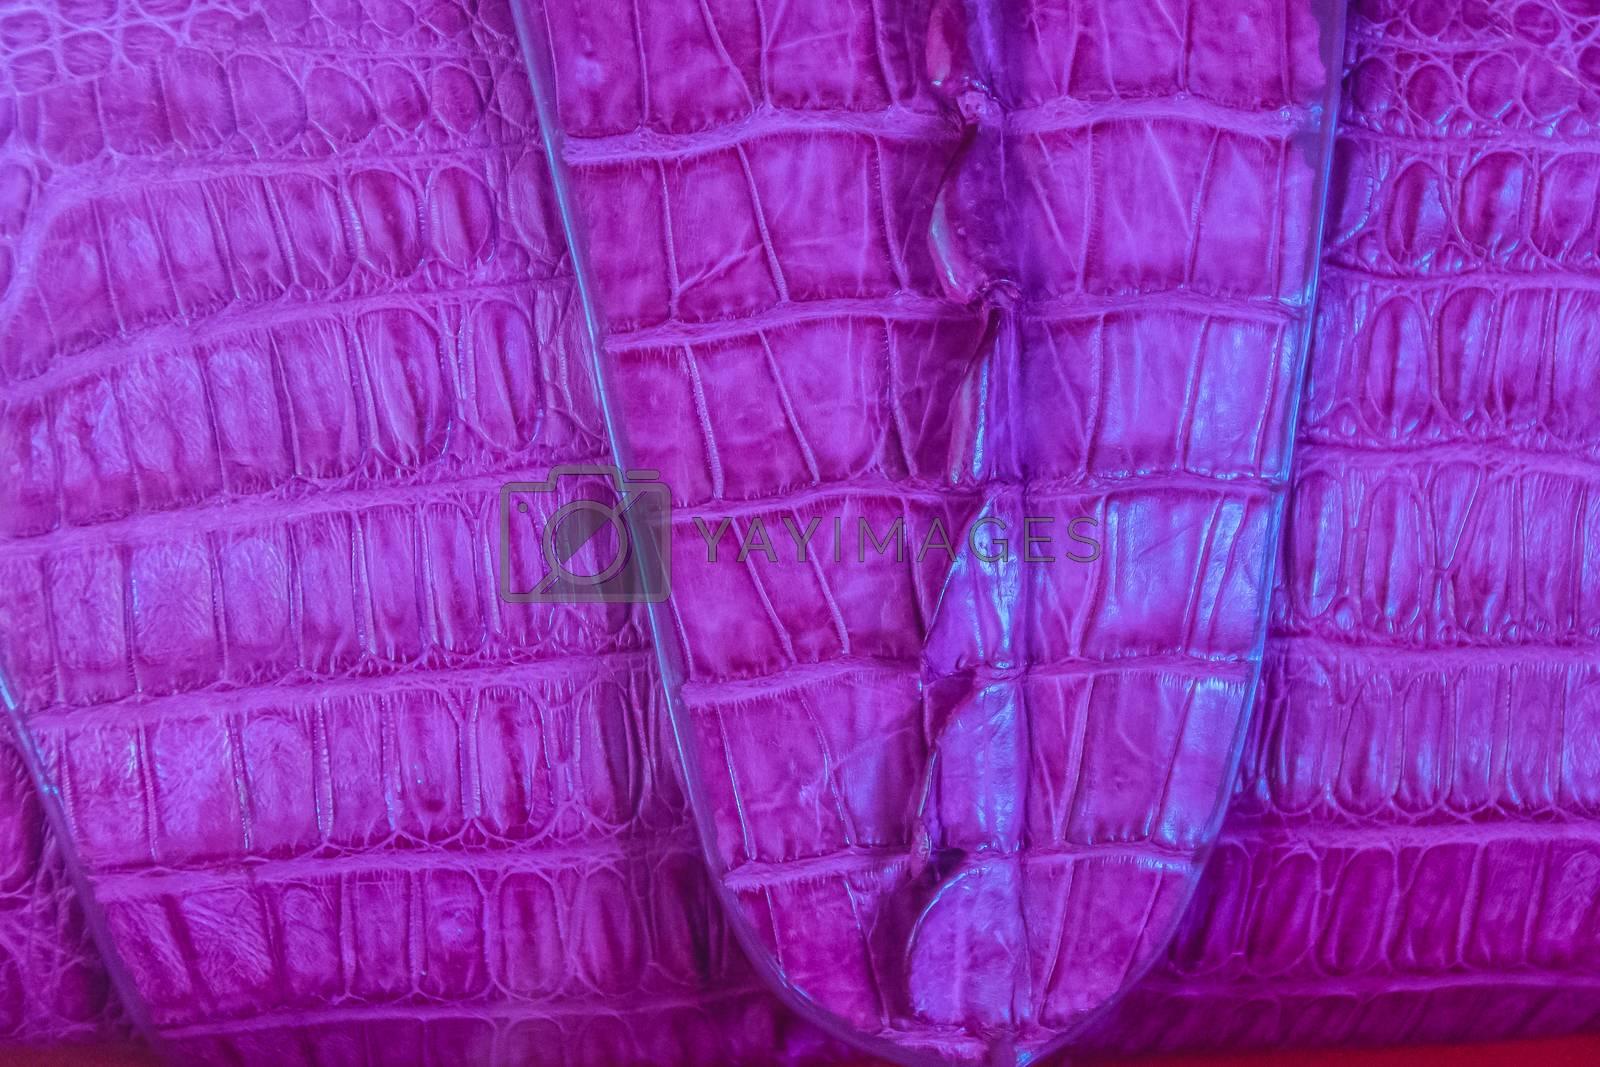 Beautiful purple crocodile leather handbag for sale in the luxury shop.